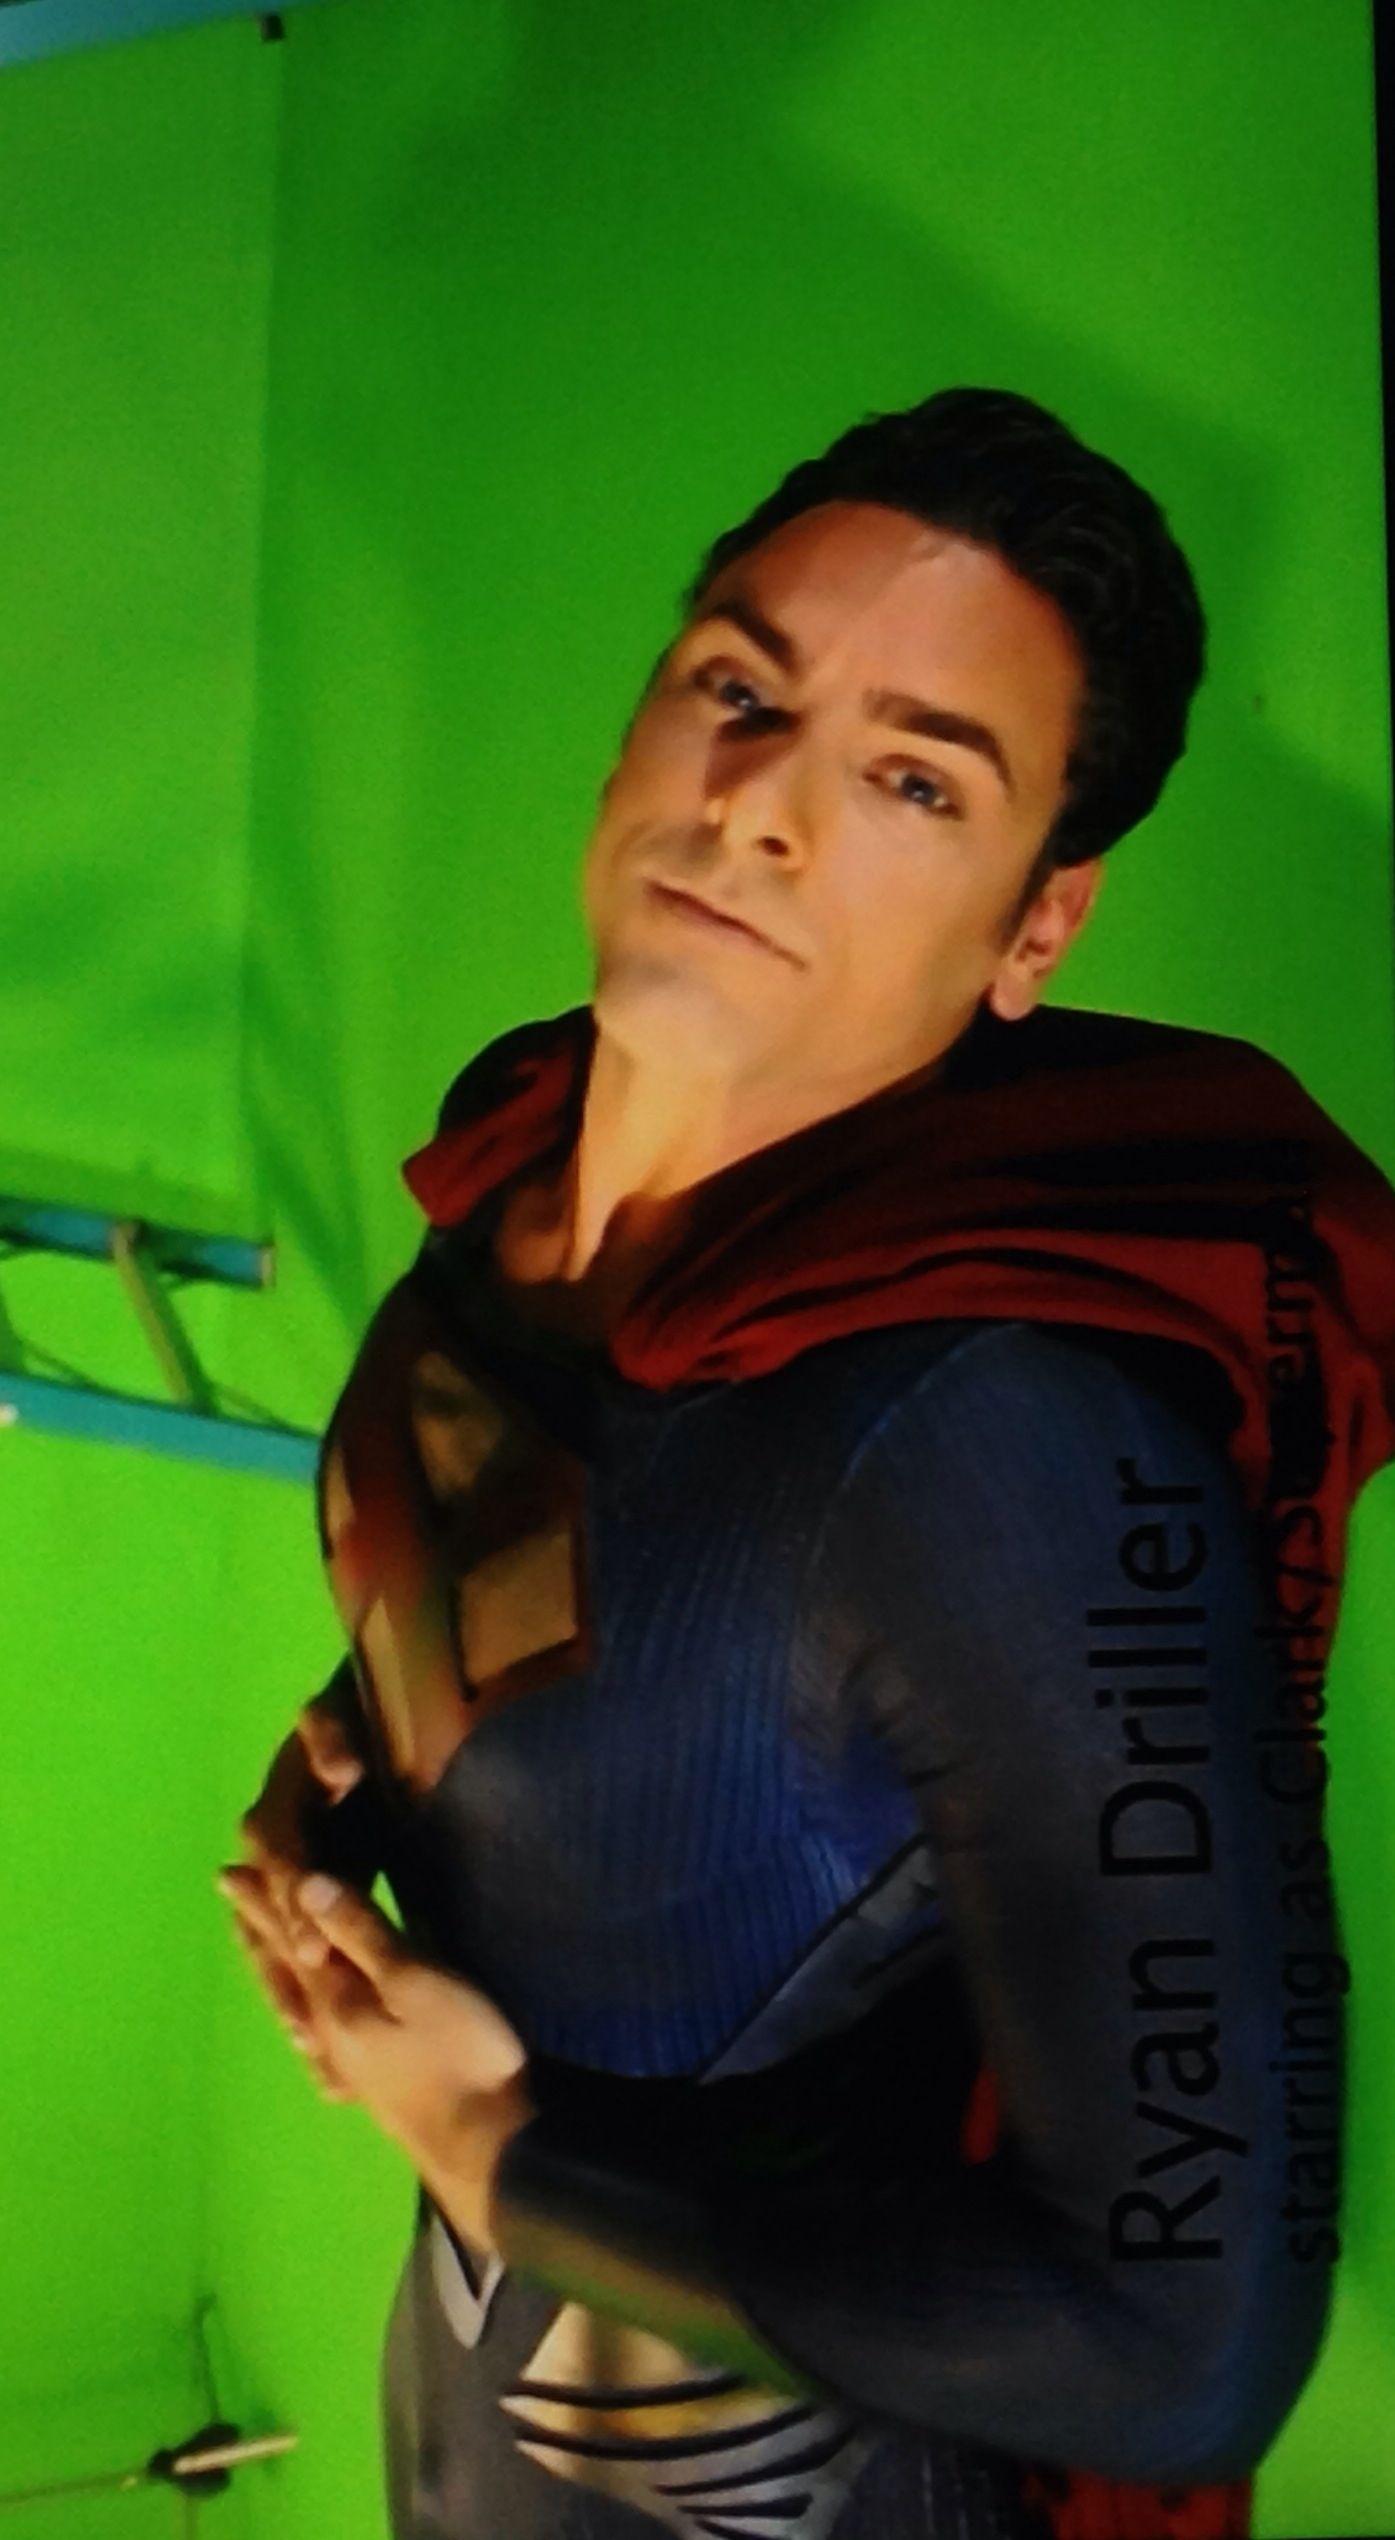 Ryan driller superman